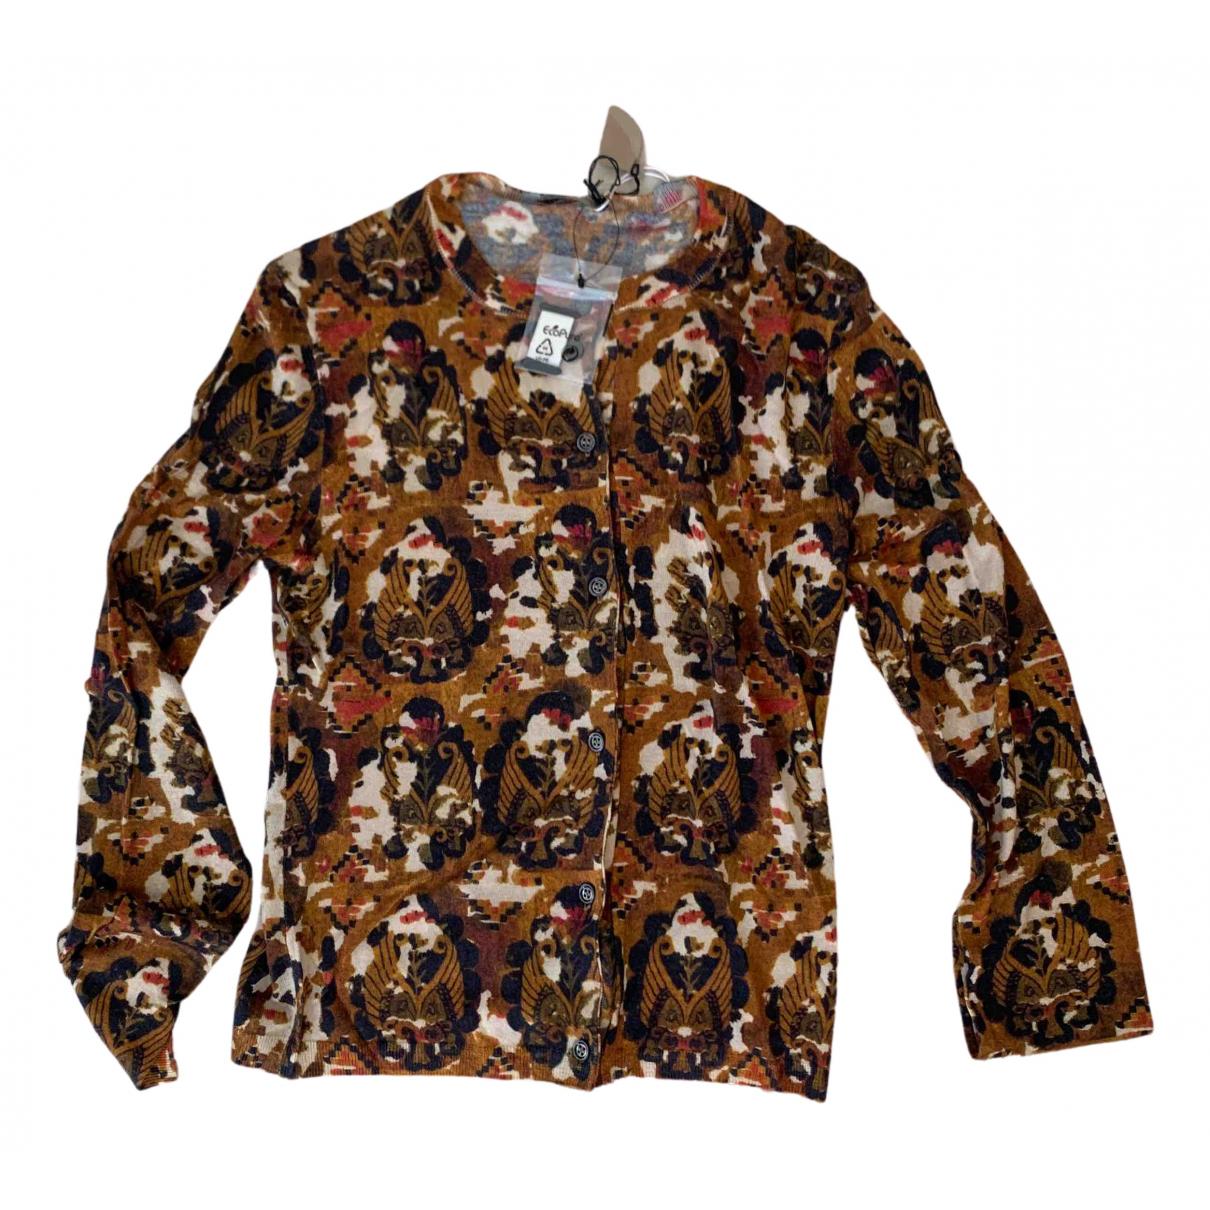 Bottega Veneta N Brown Cashmere Knitwear for Women 38 IT